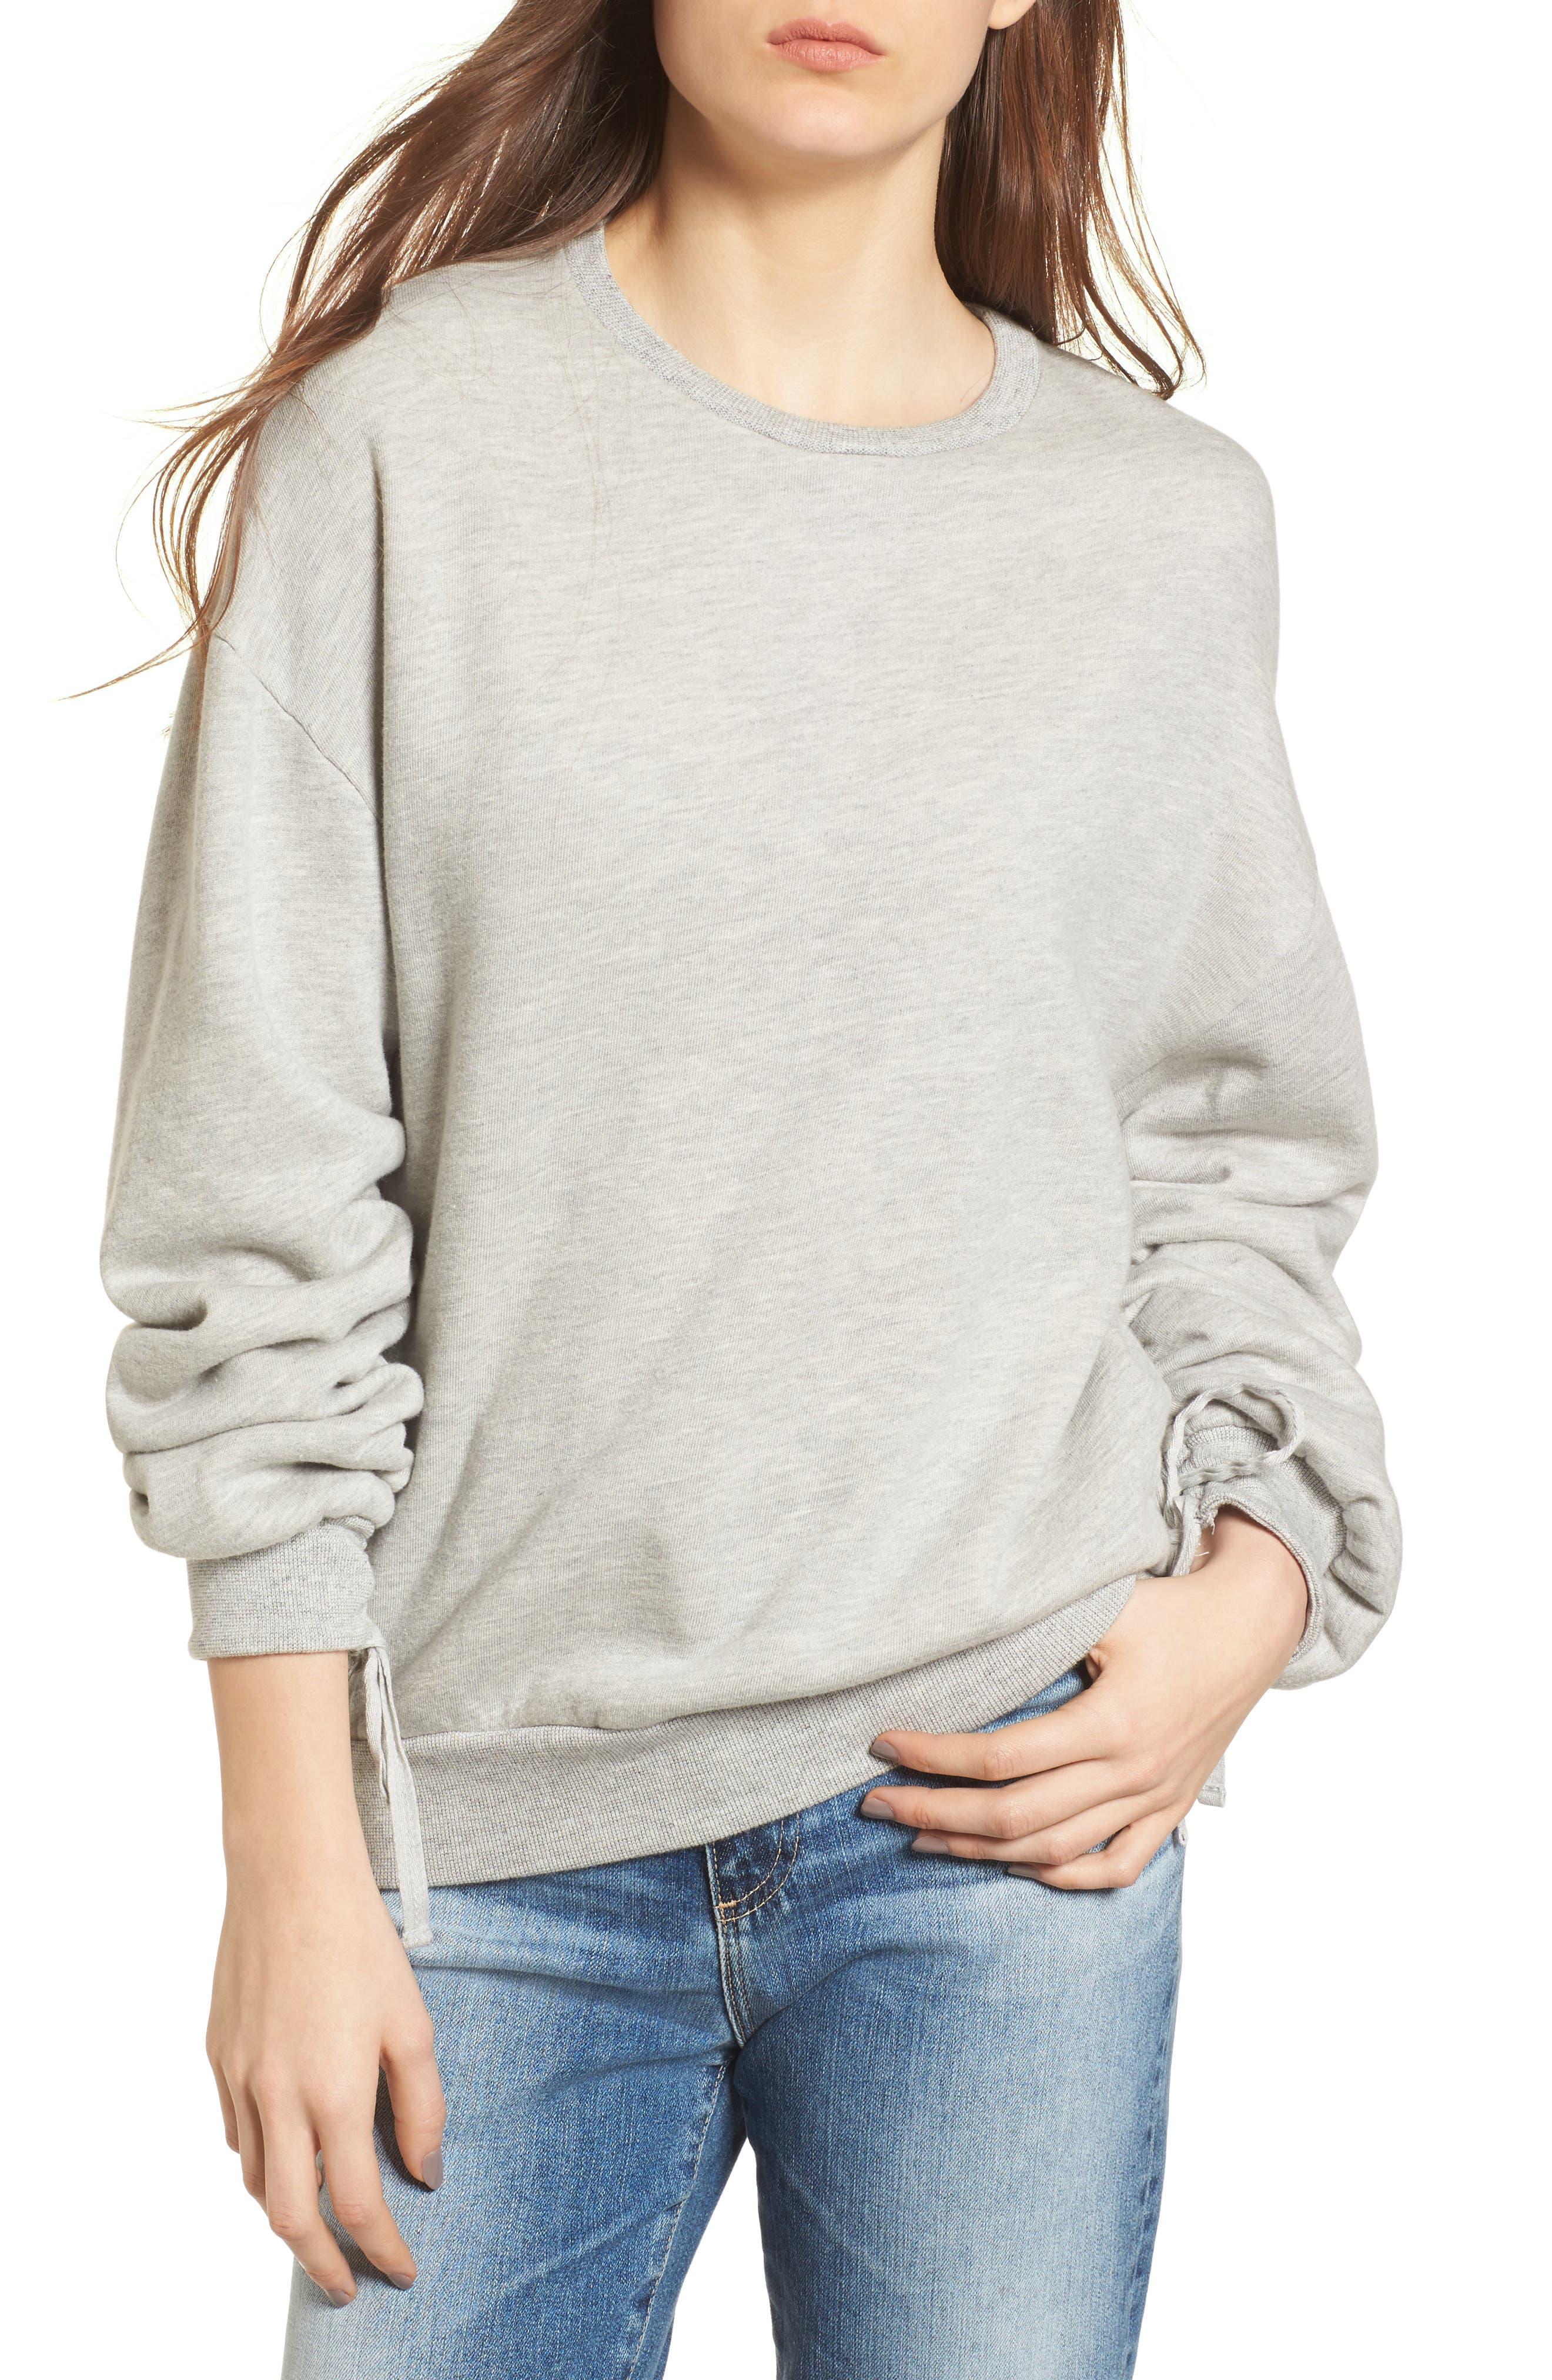 Karis Sweatshirt,                         Main,                         color, Heather Grey